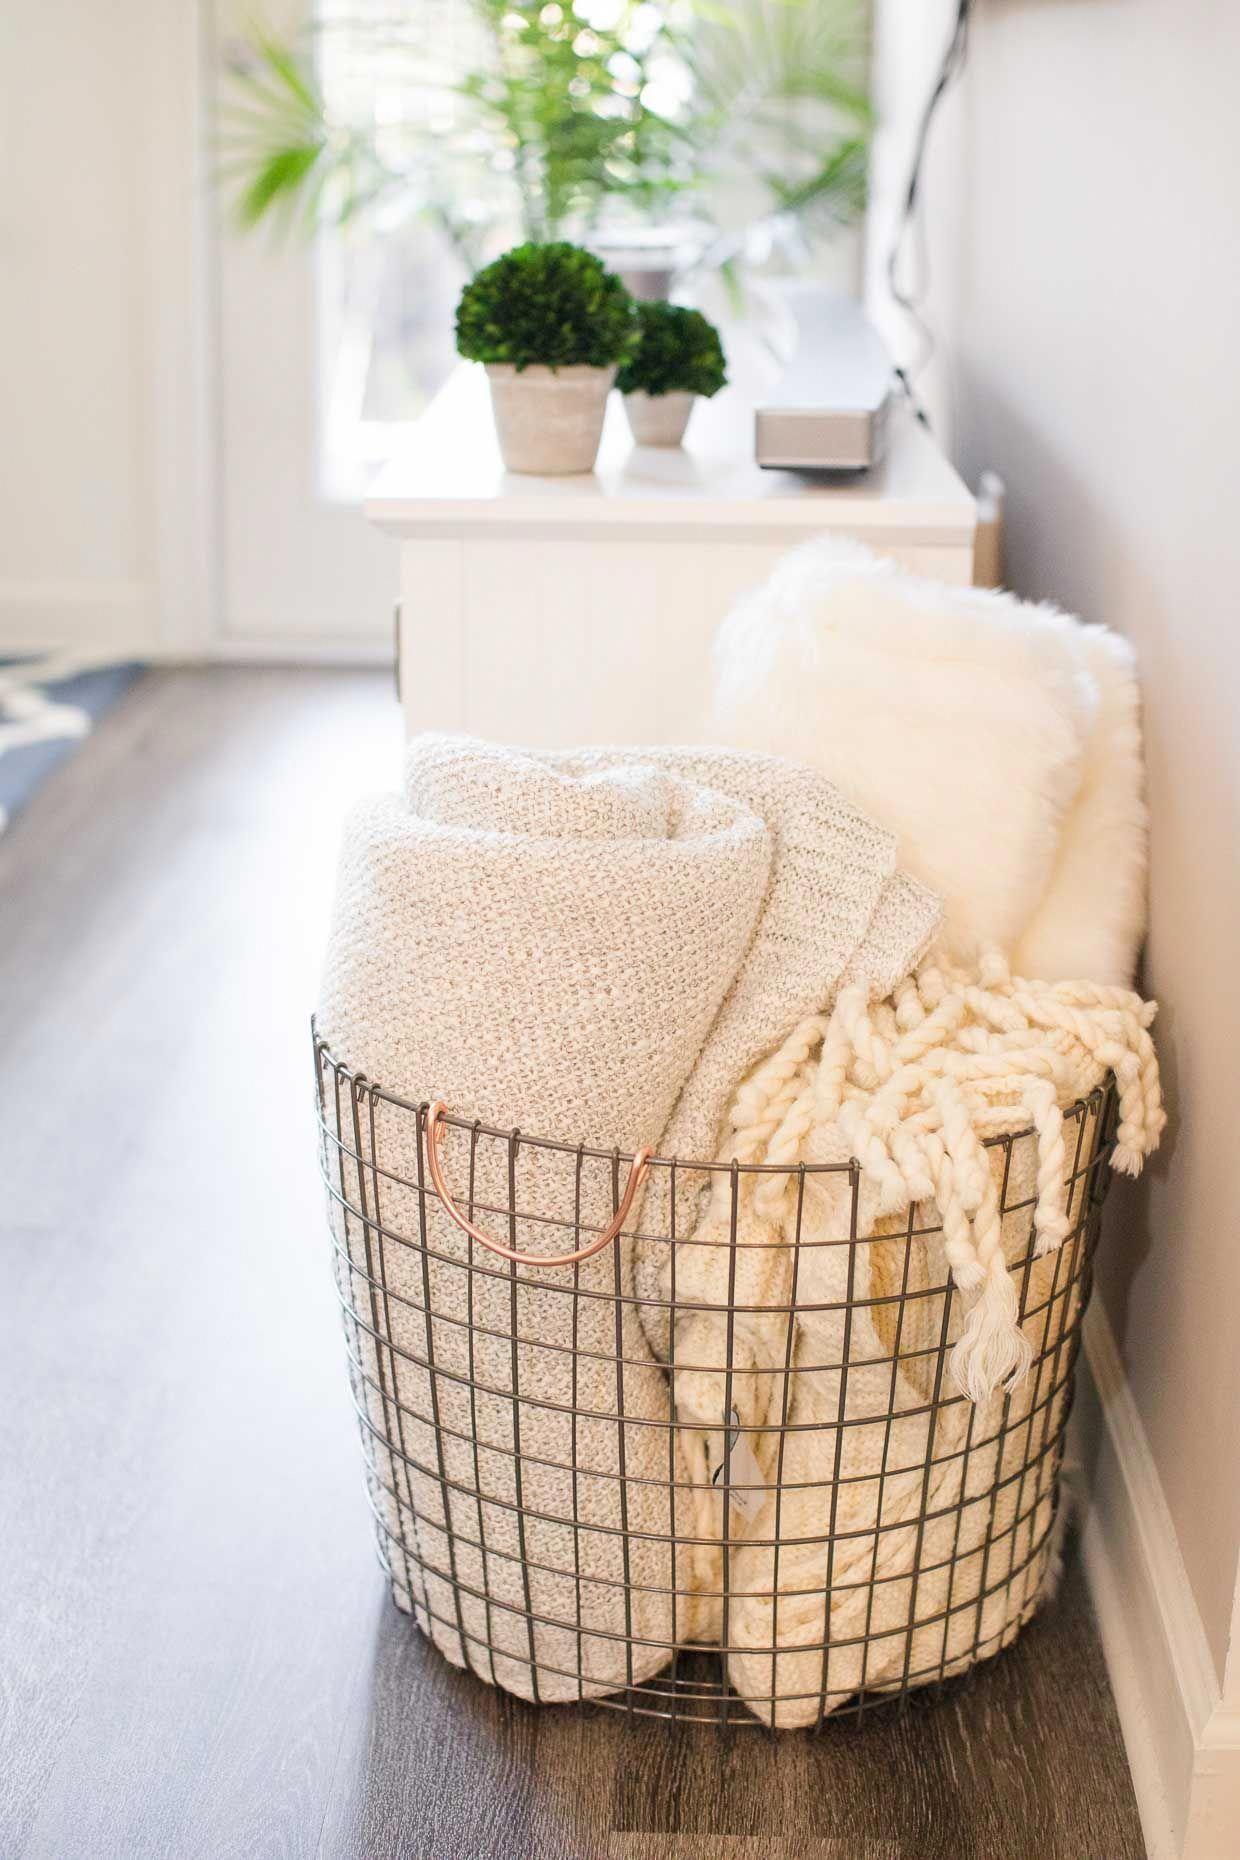 Cheap Retro Decor - SalePrice:35$ -  #homedecorlivingroommodern  - #antiquedecor #apartmentdecor #bedroomdecor #cheap #decor #homedecor #Retro #saleprice